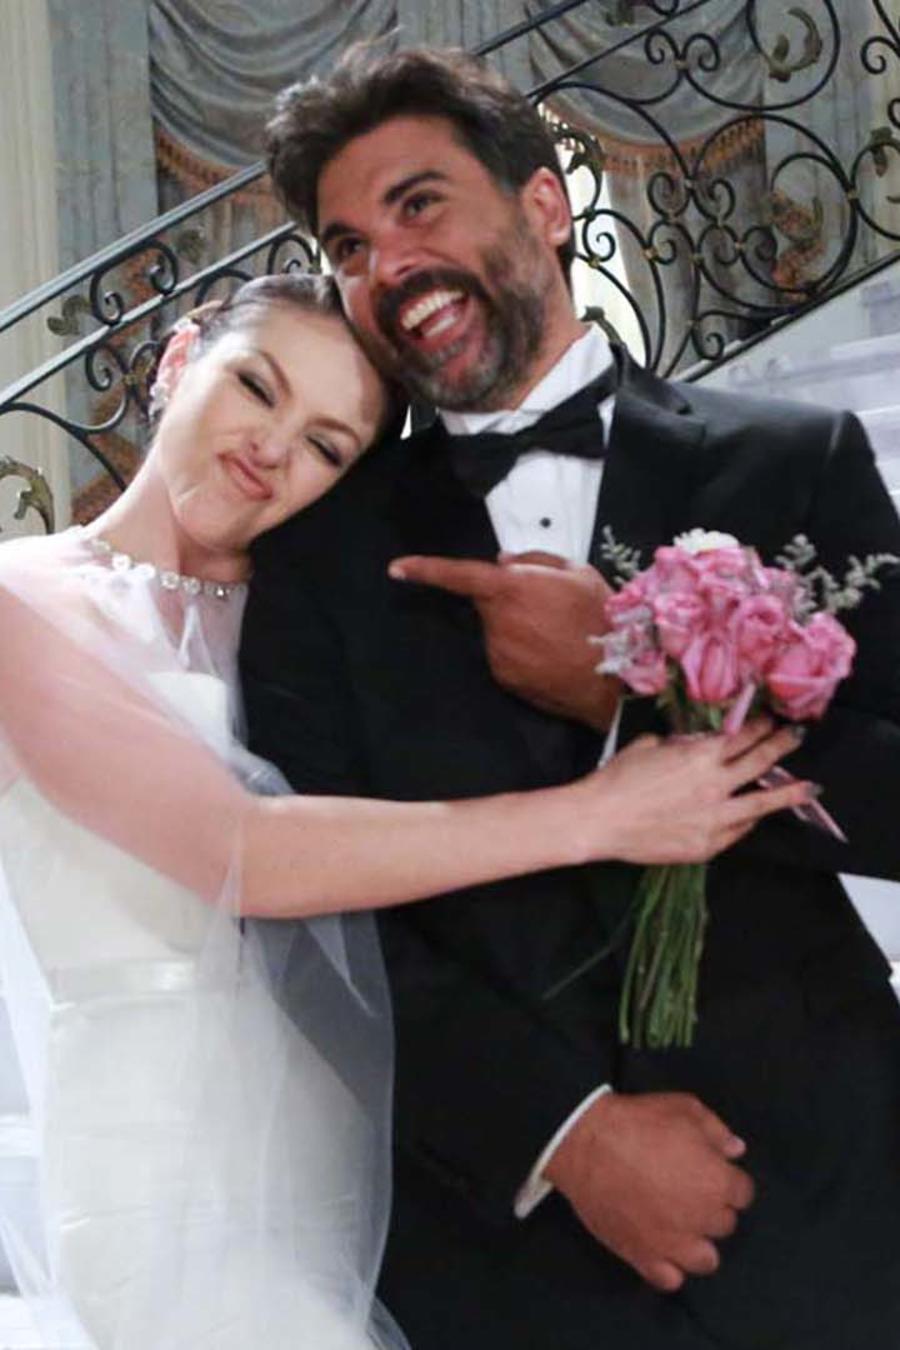 Erika de la Rosa y Jorge Luis pila detrás de cámaras boda en Eva la trailera